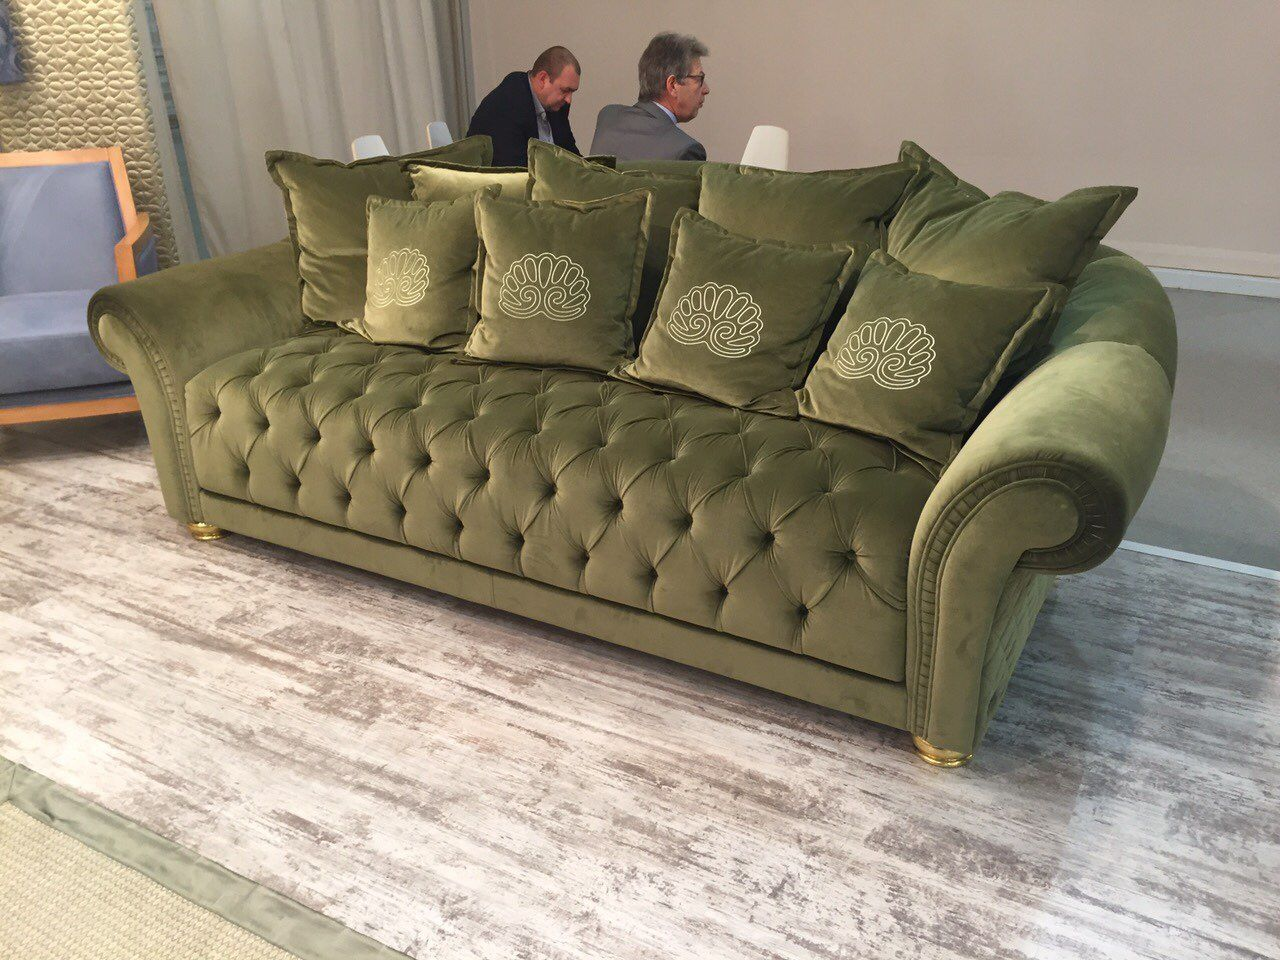 Выставка мебели Salone del Mobile